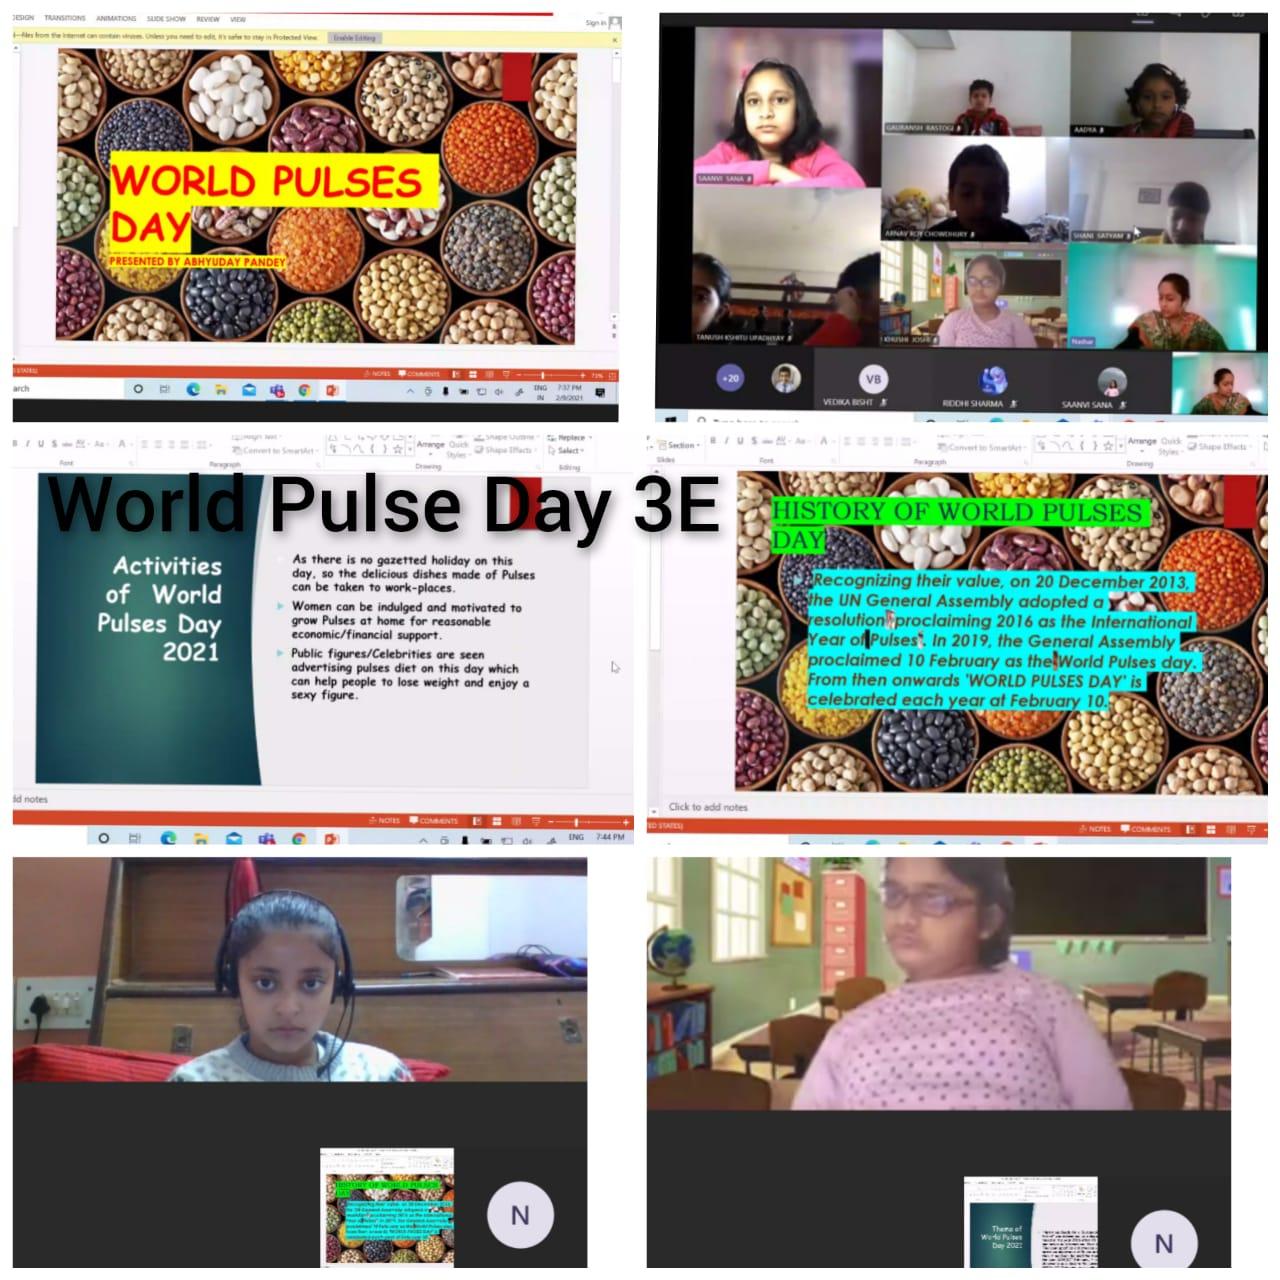 WORLD PULSES DAY-2021